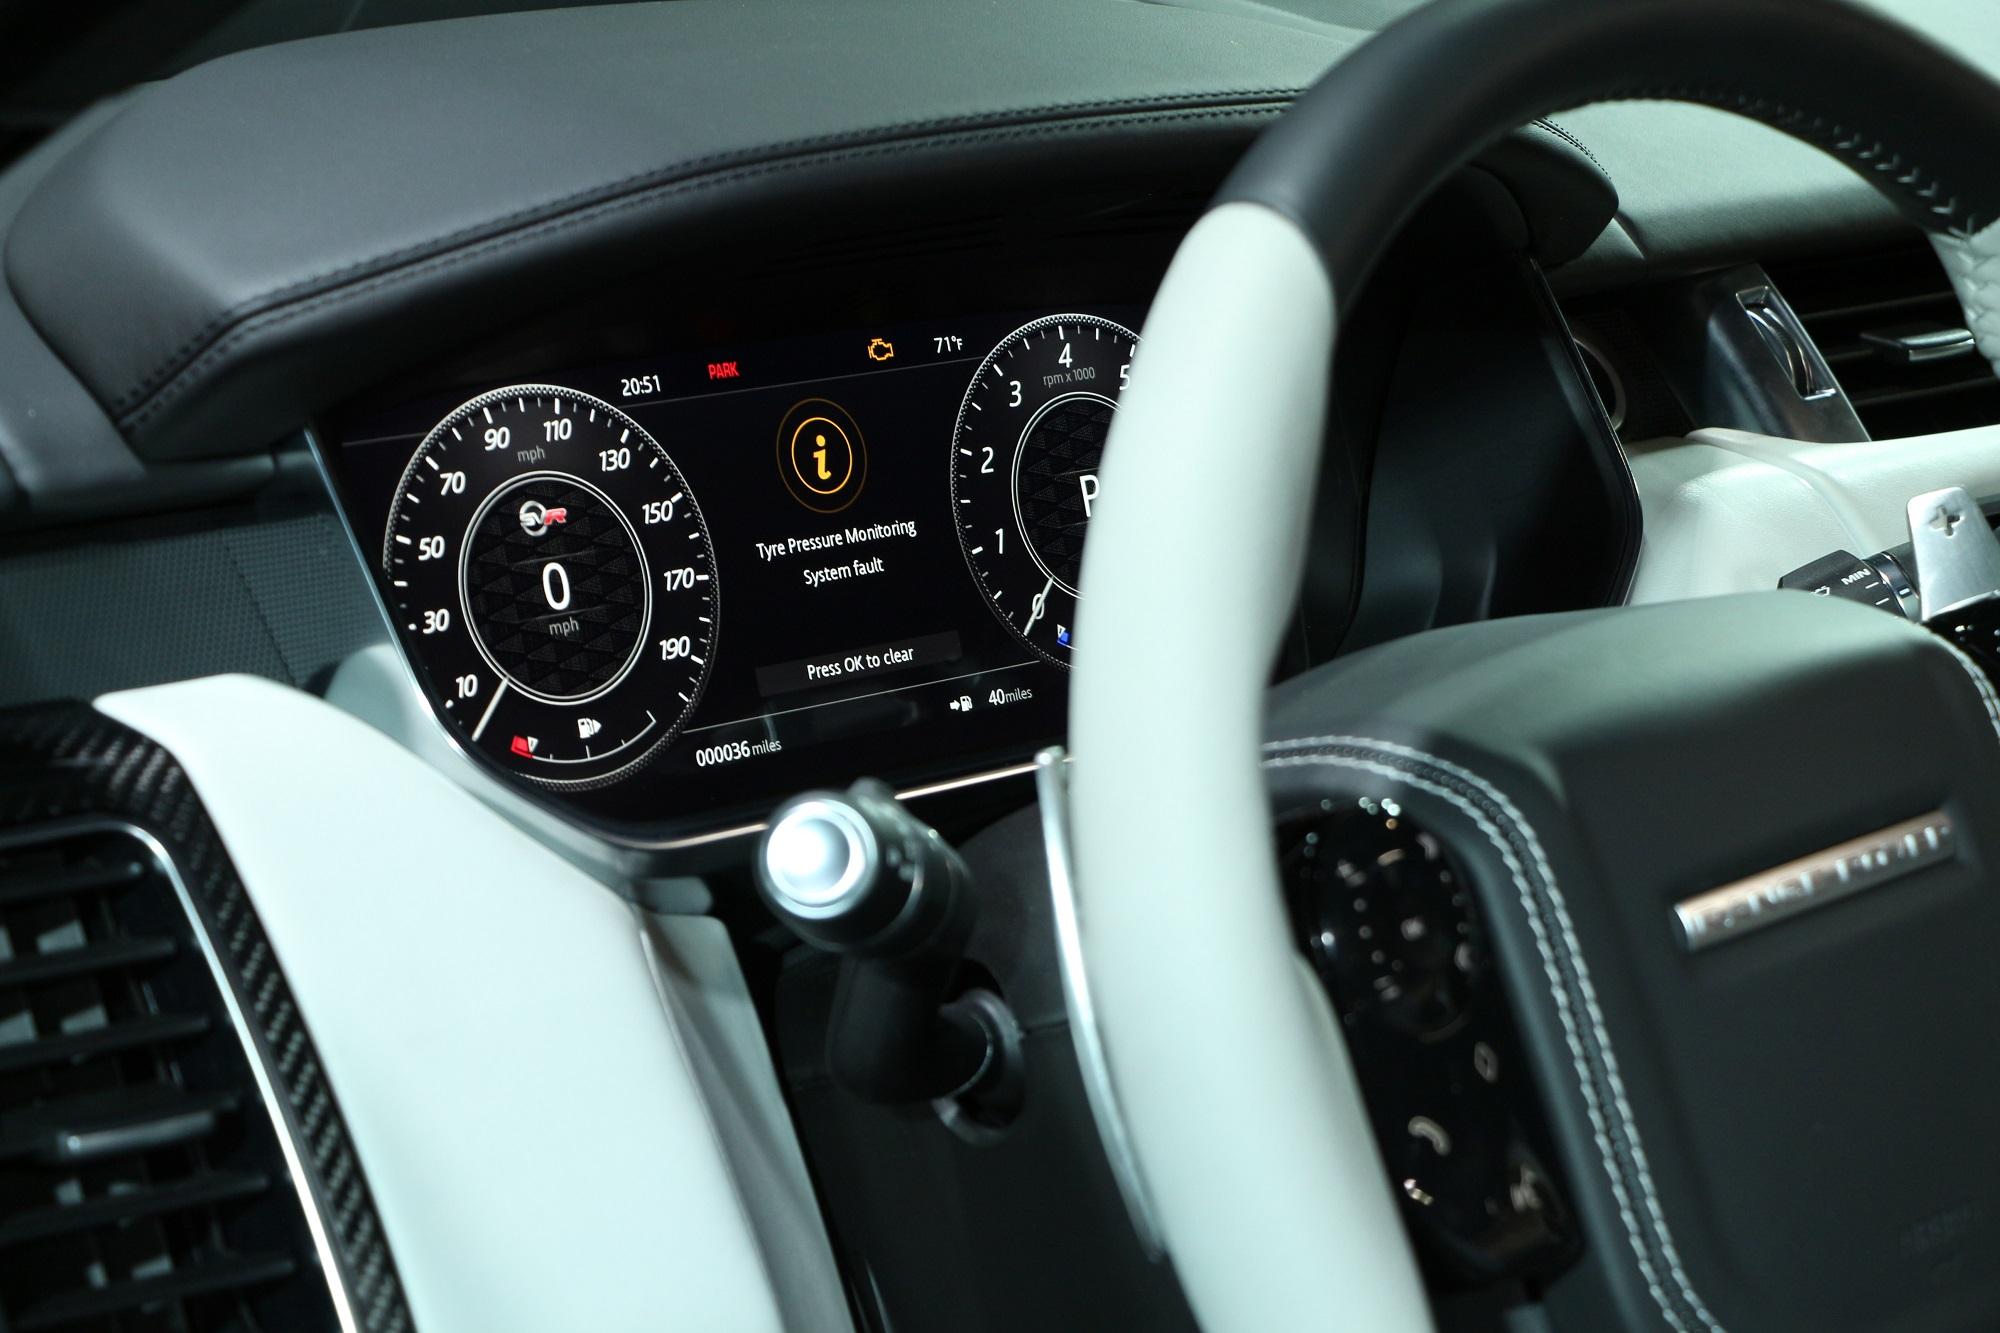 Jaguarforums.com Land Rover Range Rover SVR Sport SVX SVAutobiography LA L.A. Los Angeles Auto Show 2017 2018 Discovery Evoque Velar